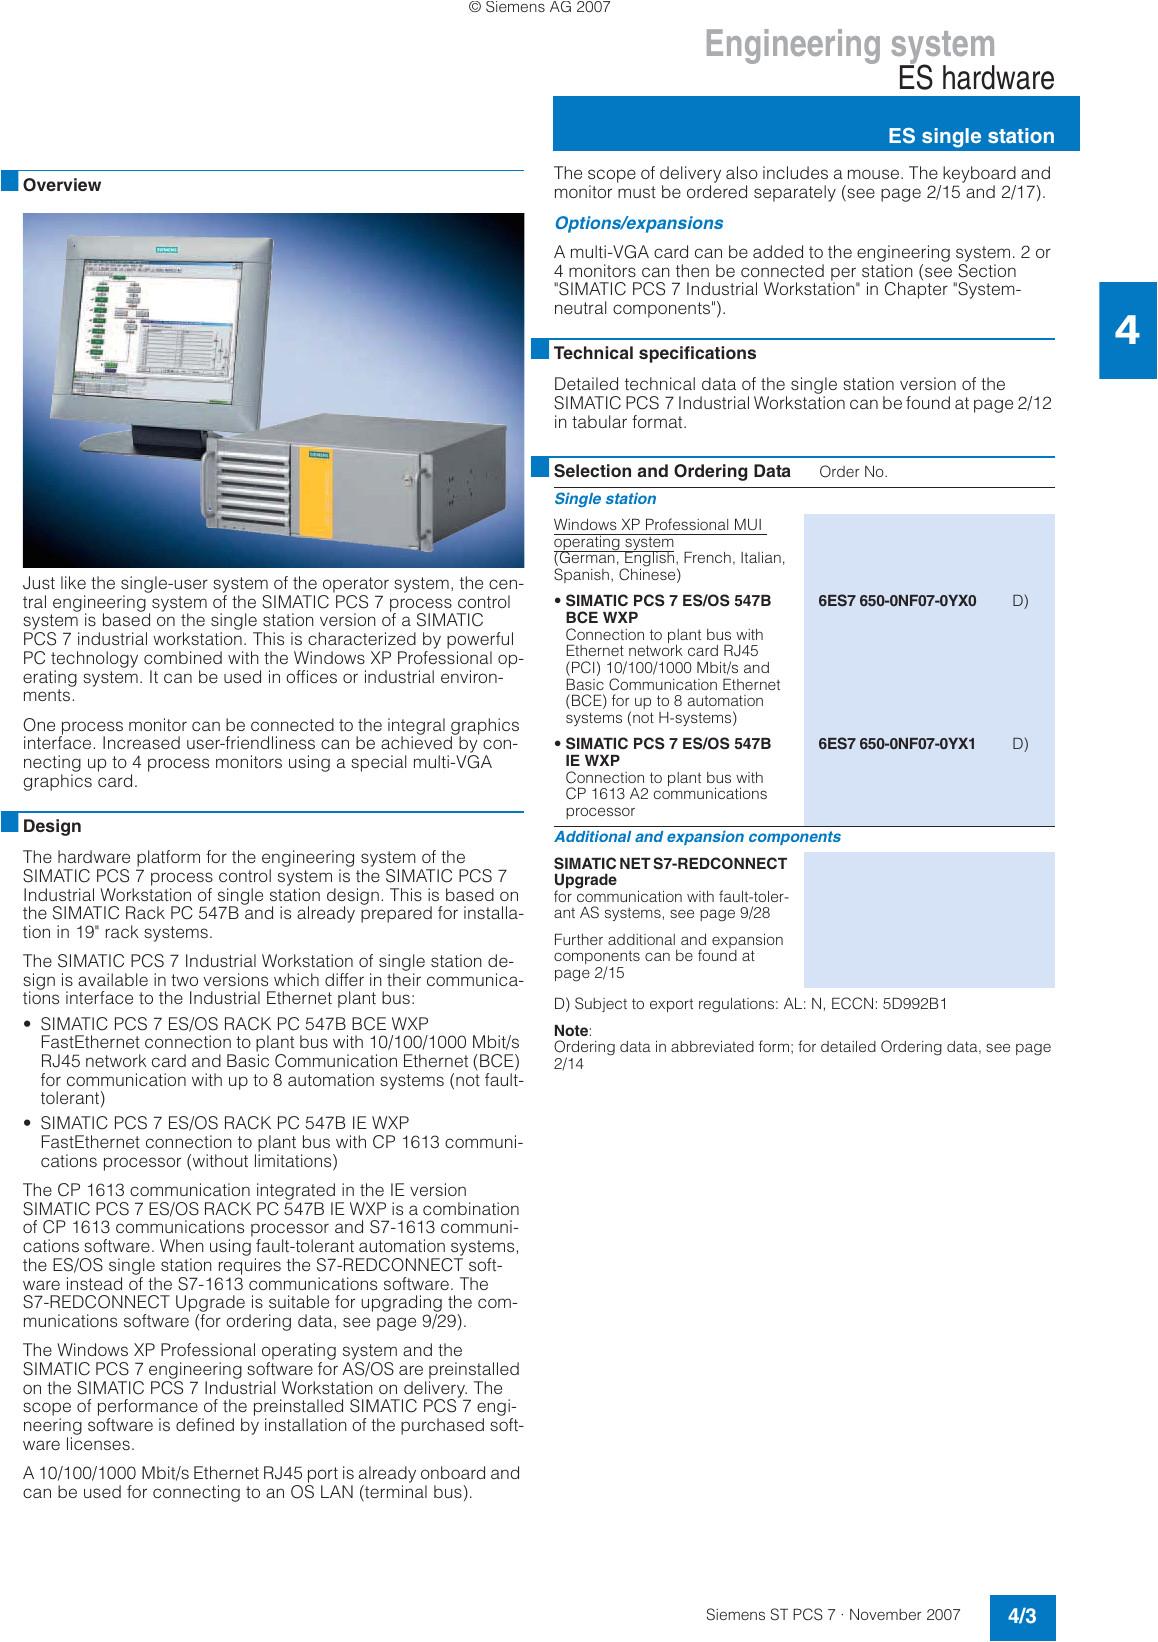 siemensweldingsystemstpcs7usersmanual410671 1424673106 user guide page 49 png